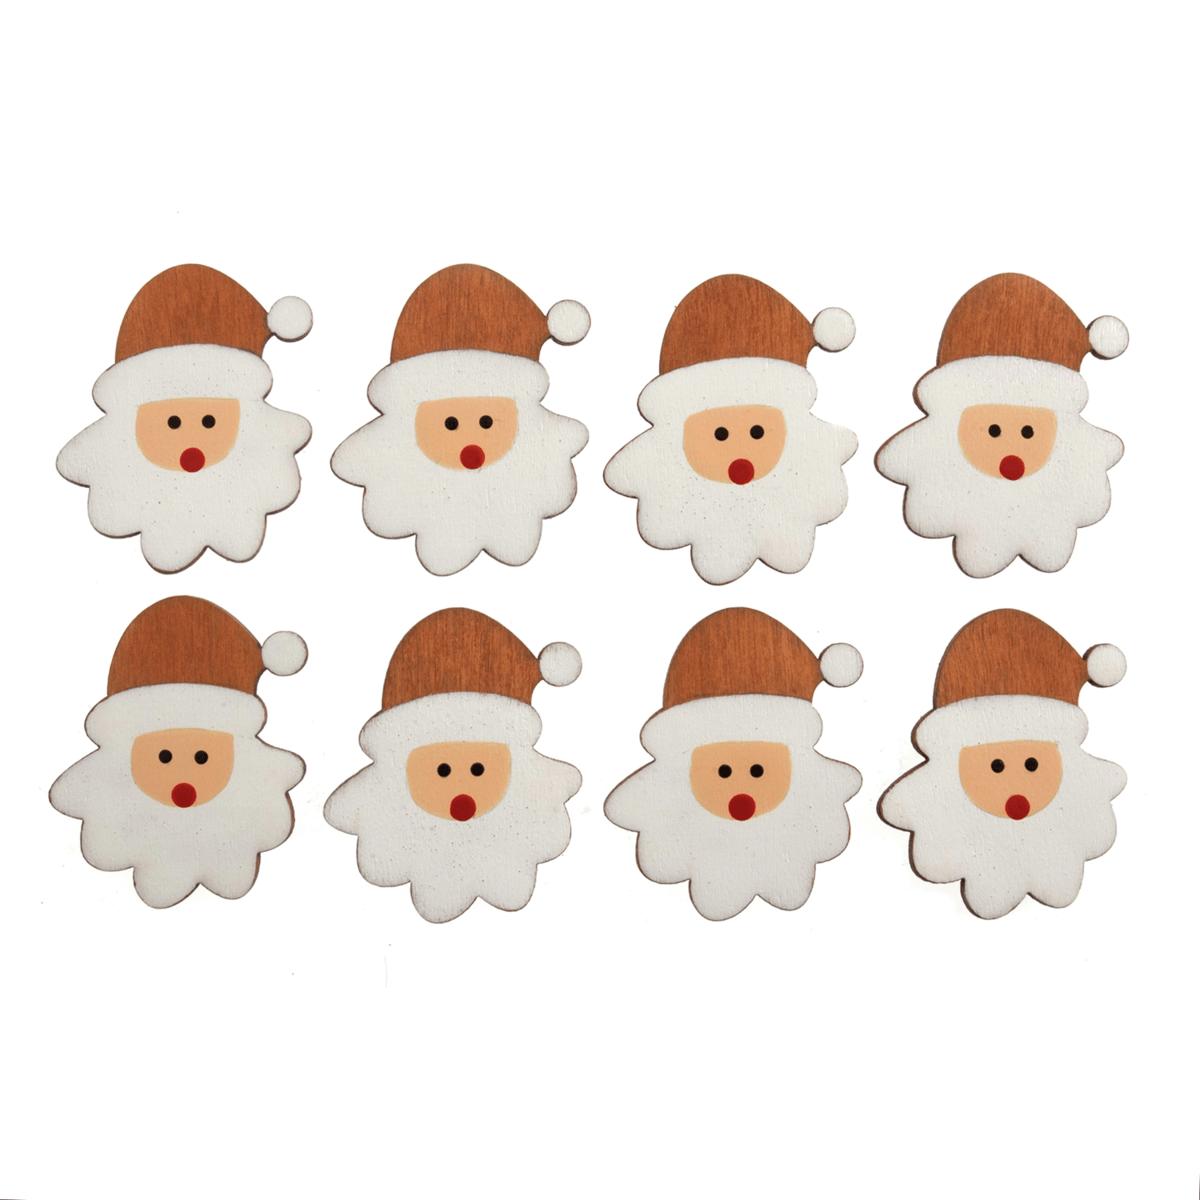 10 x Christmas Wooden Santa Head Embellishments Scrap booking